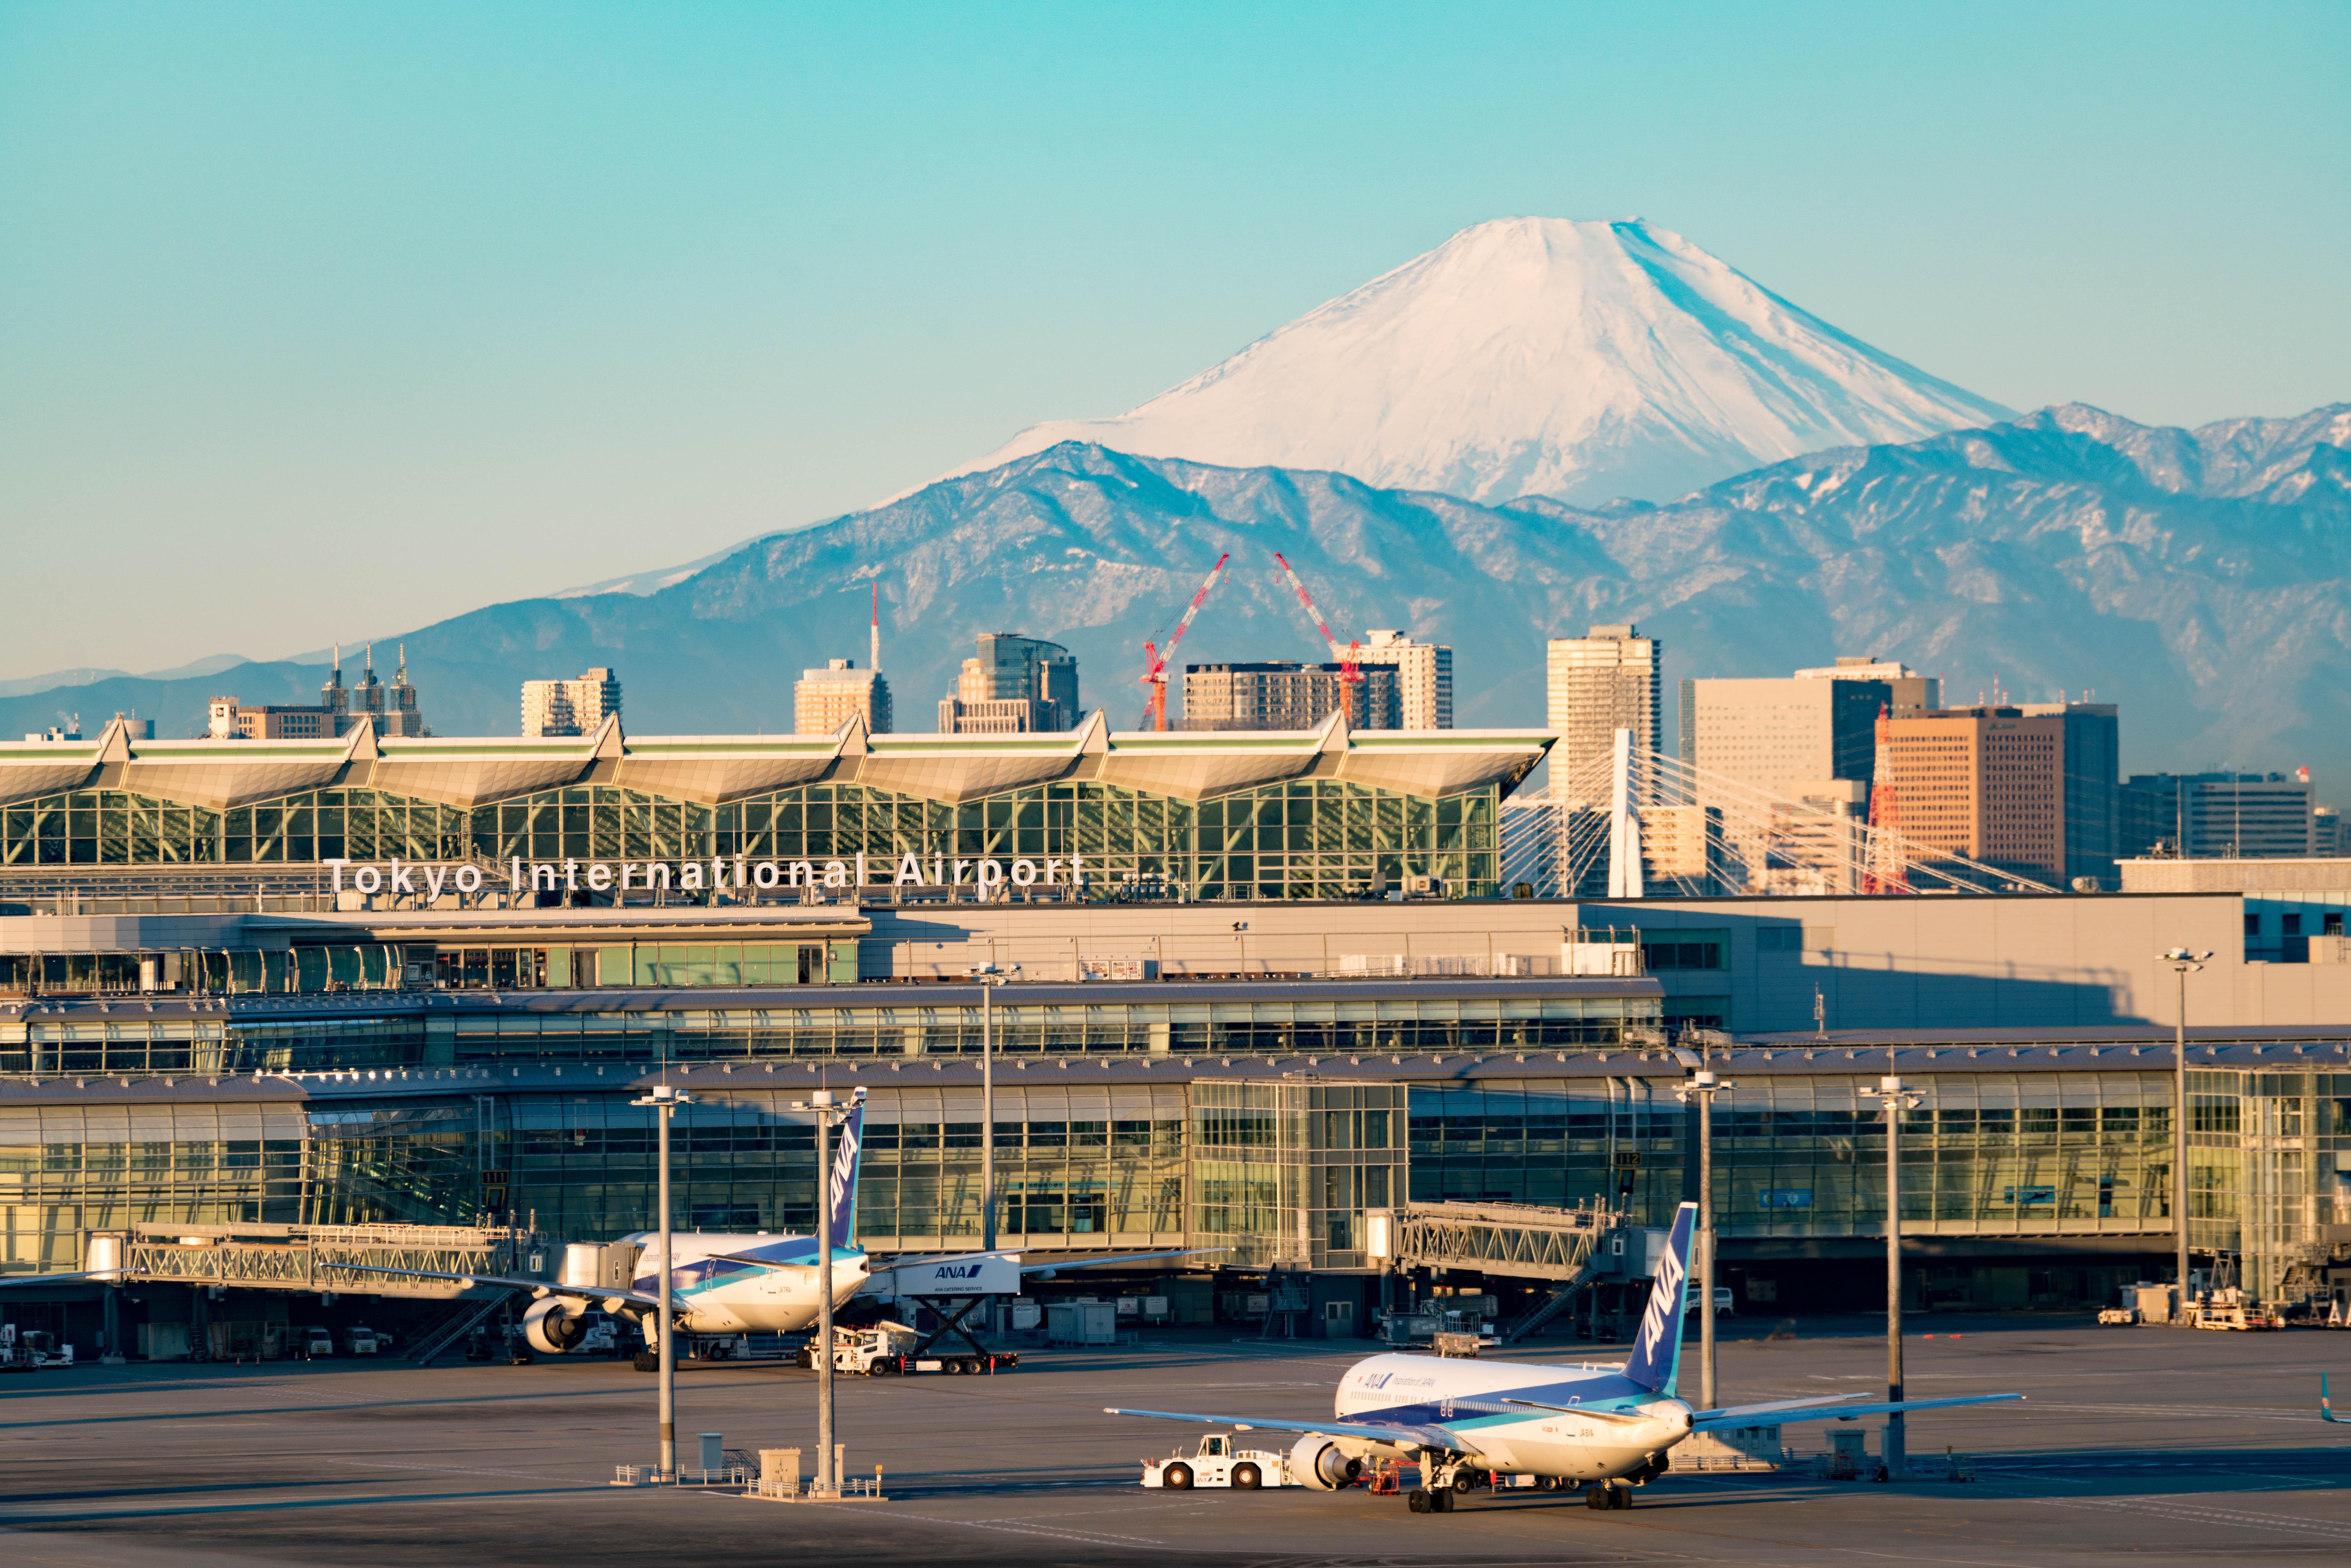 Tokyo Haneda International